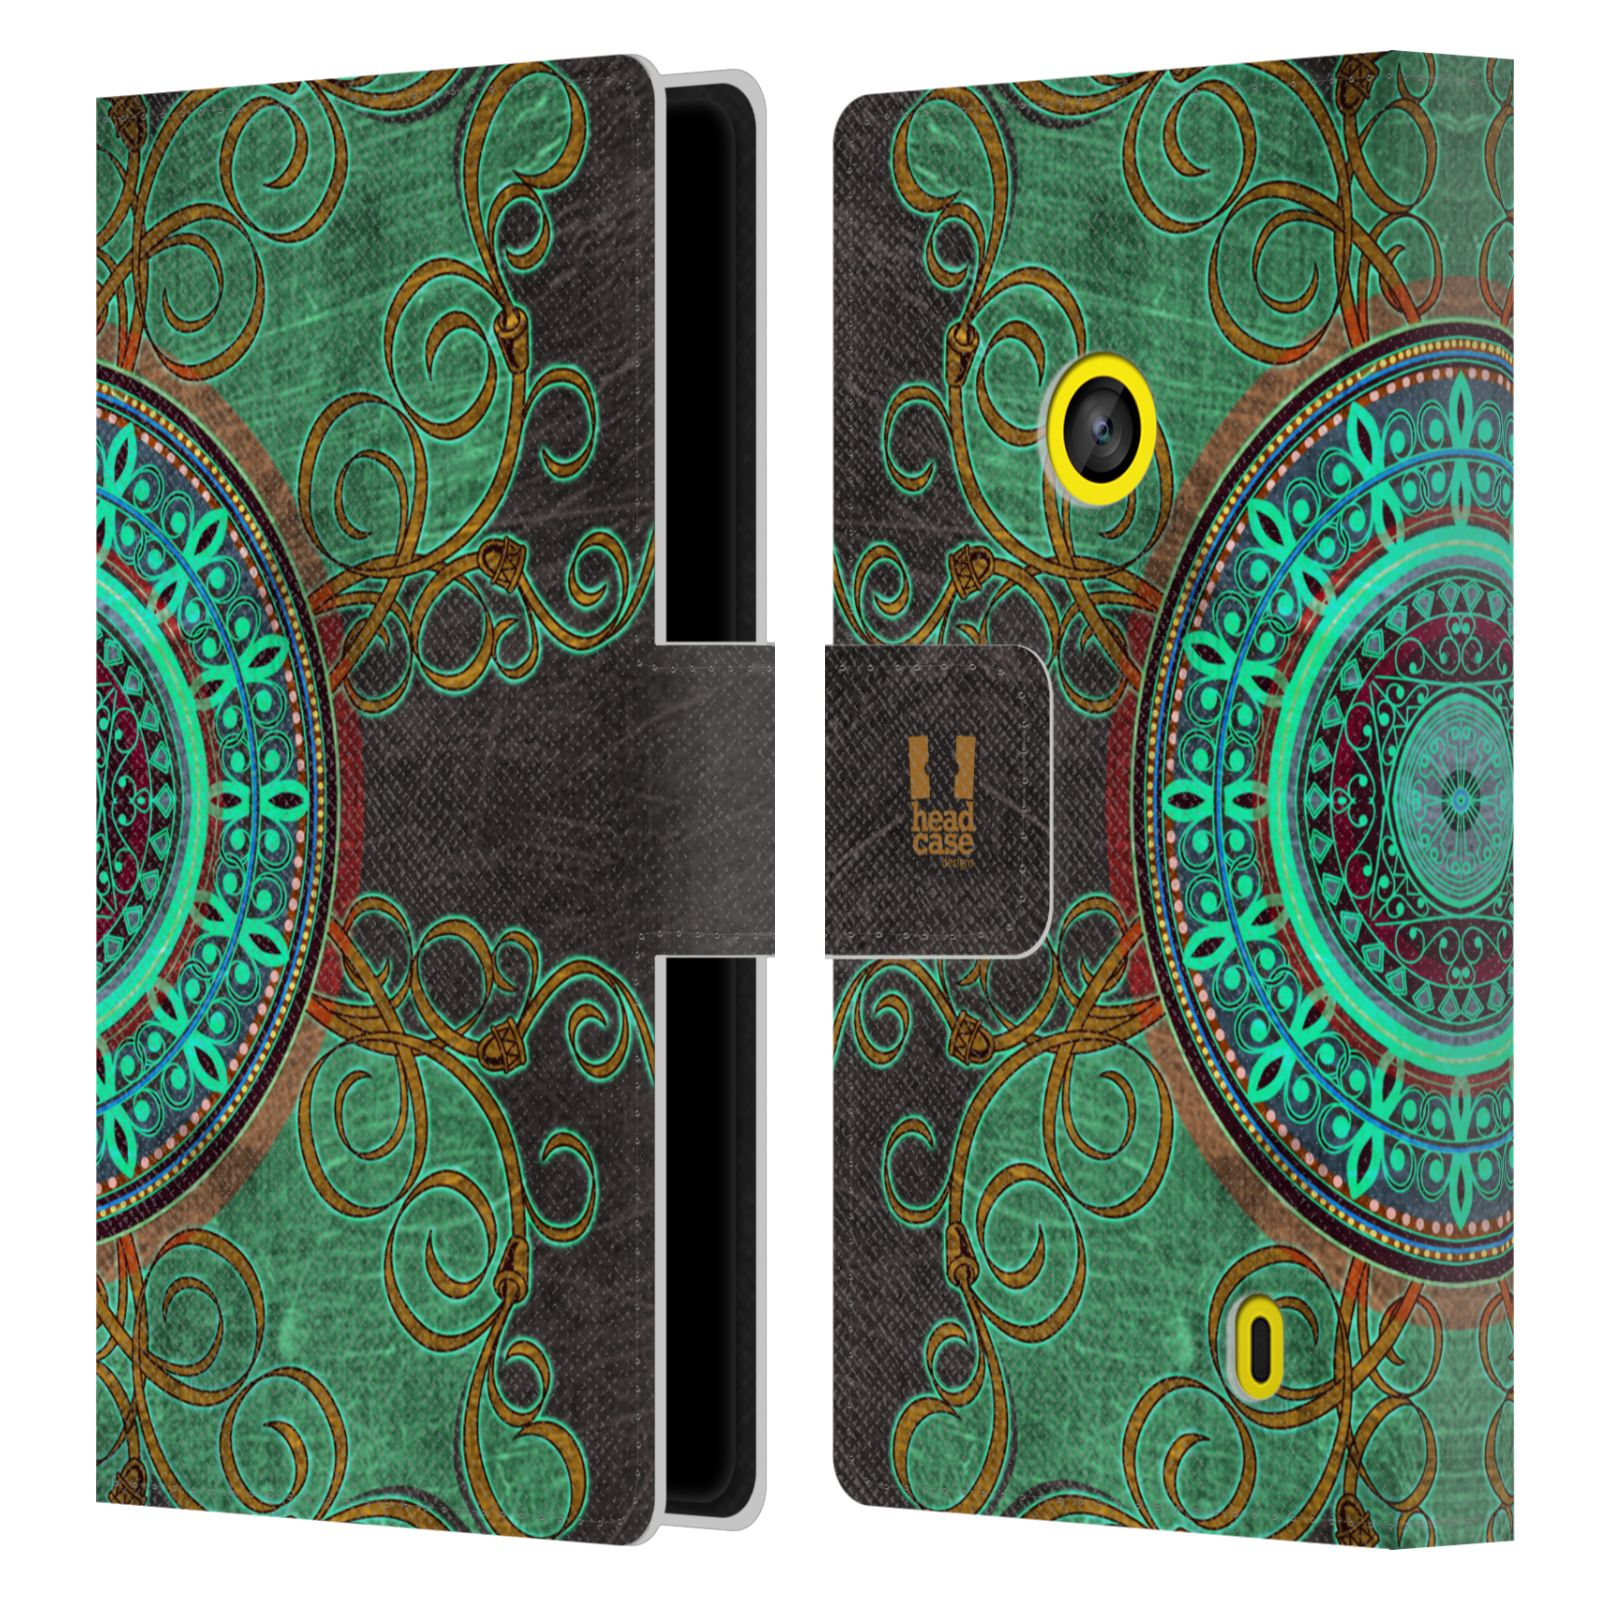 HEAD CASE Flipové pouzdro pro mobil NOKIA LUMIA 520 / 525 ARABESKA mandala zelená